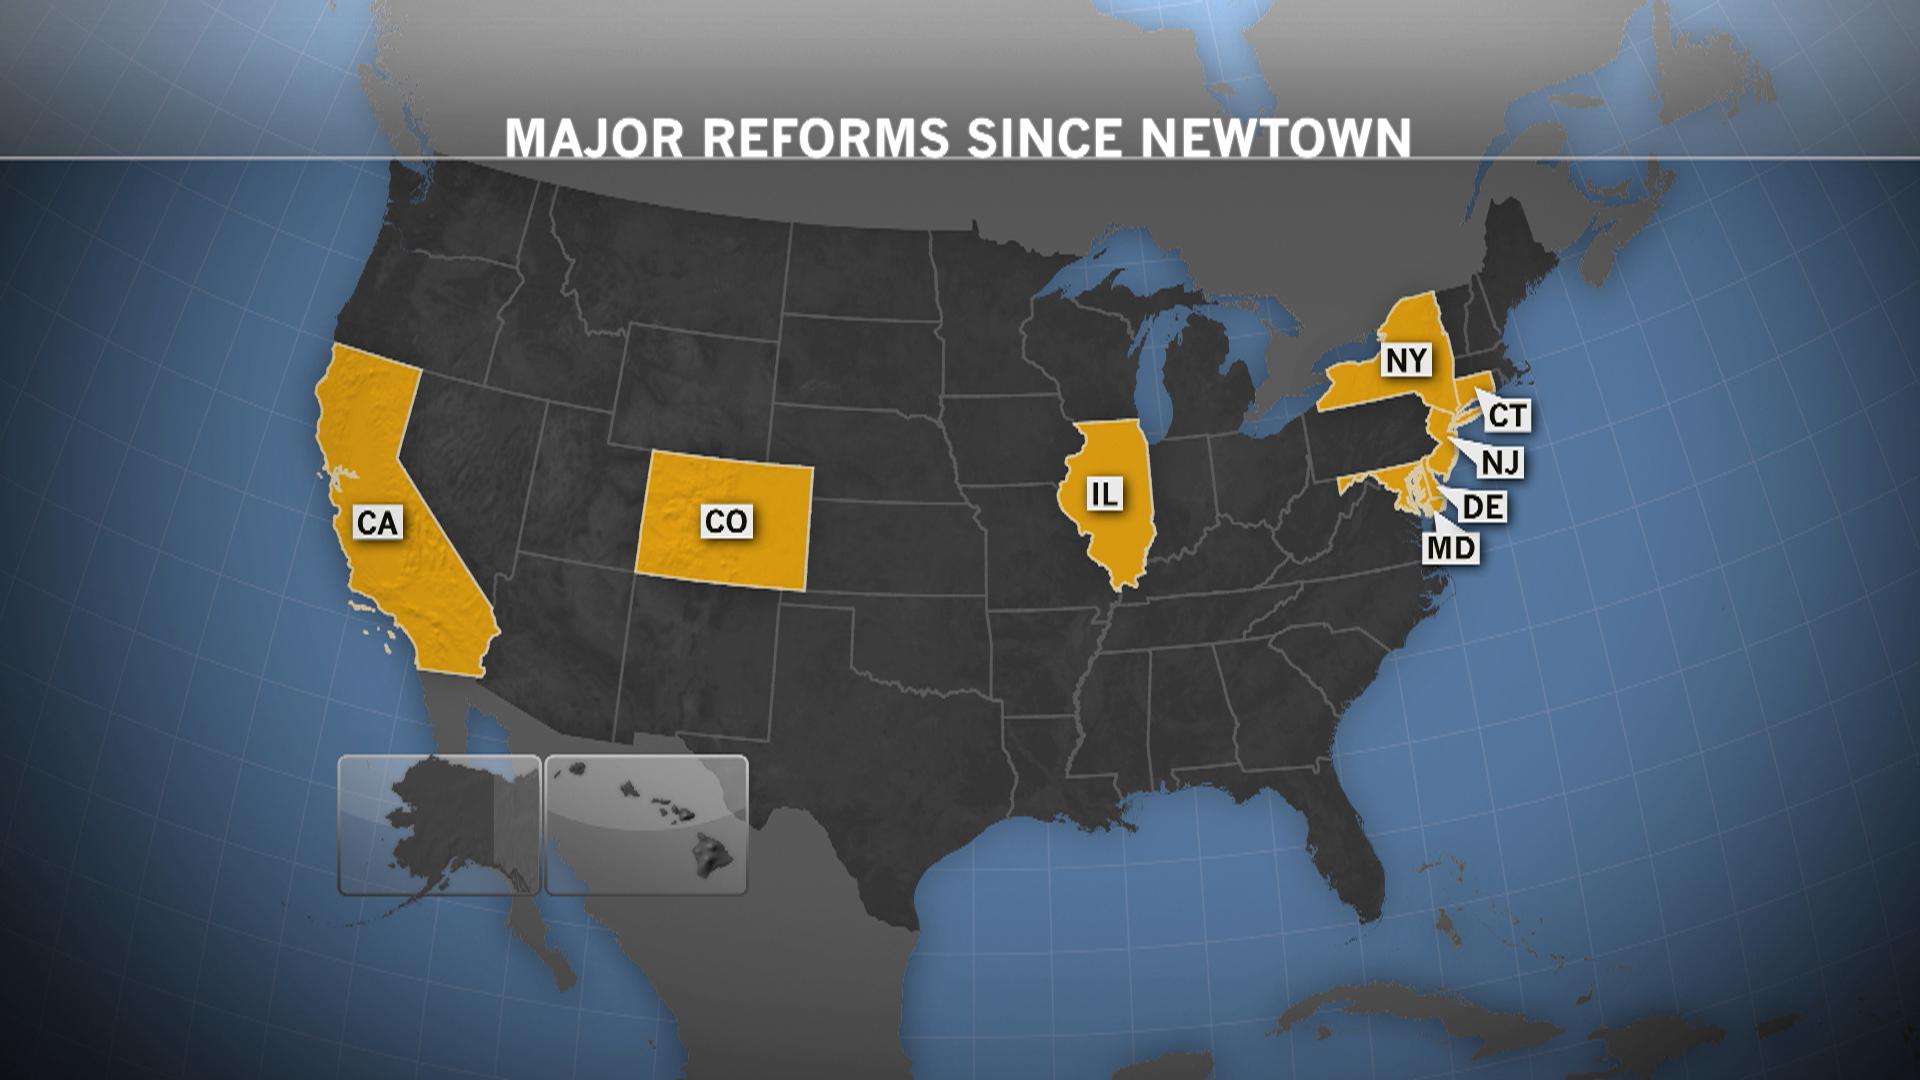 Since Newtown, gun laws have changed